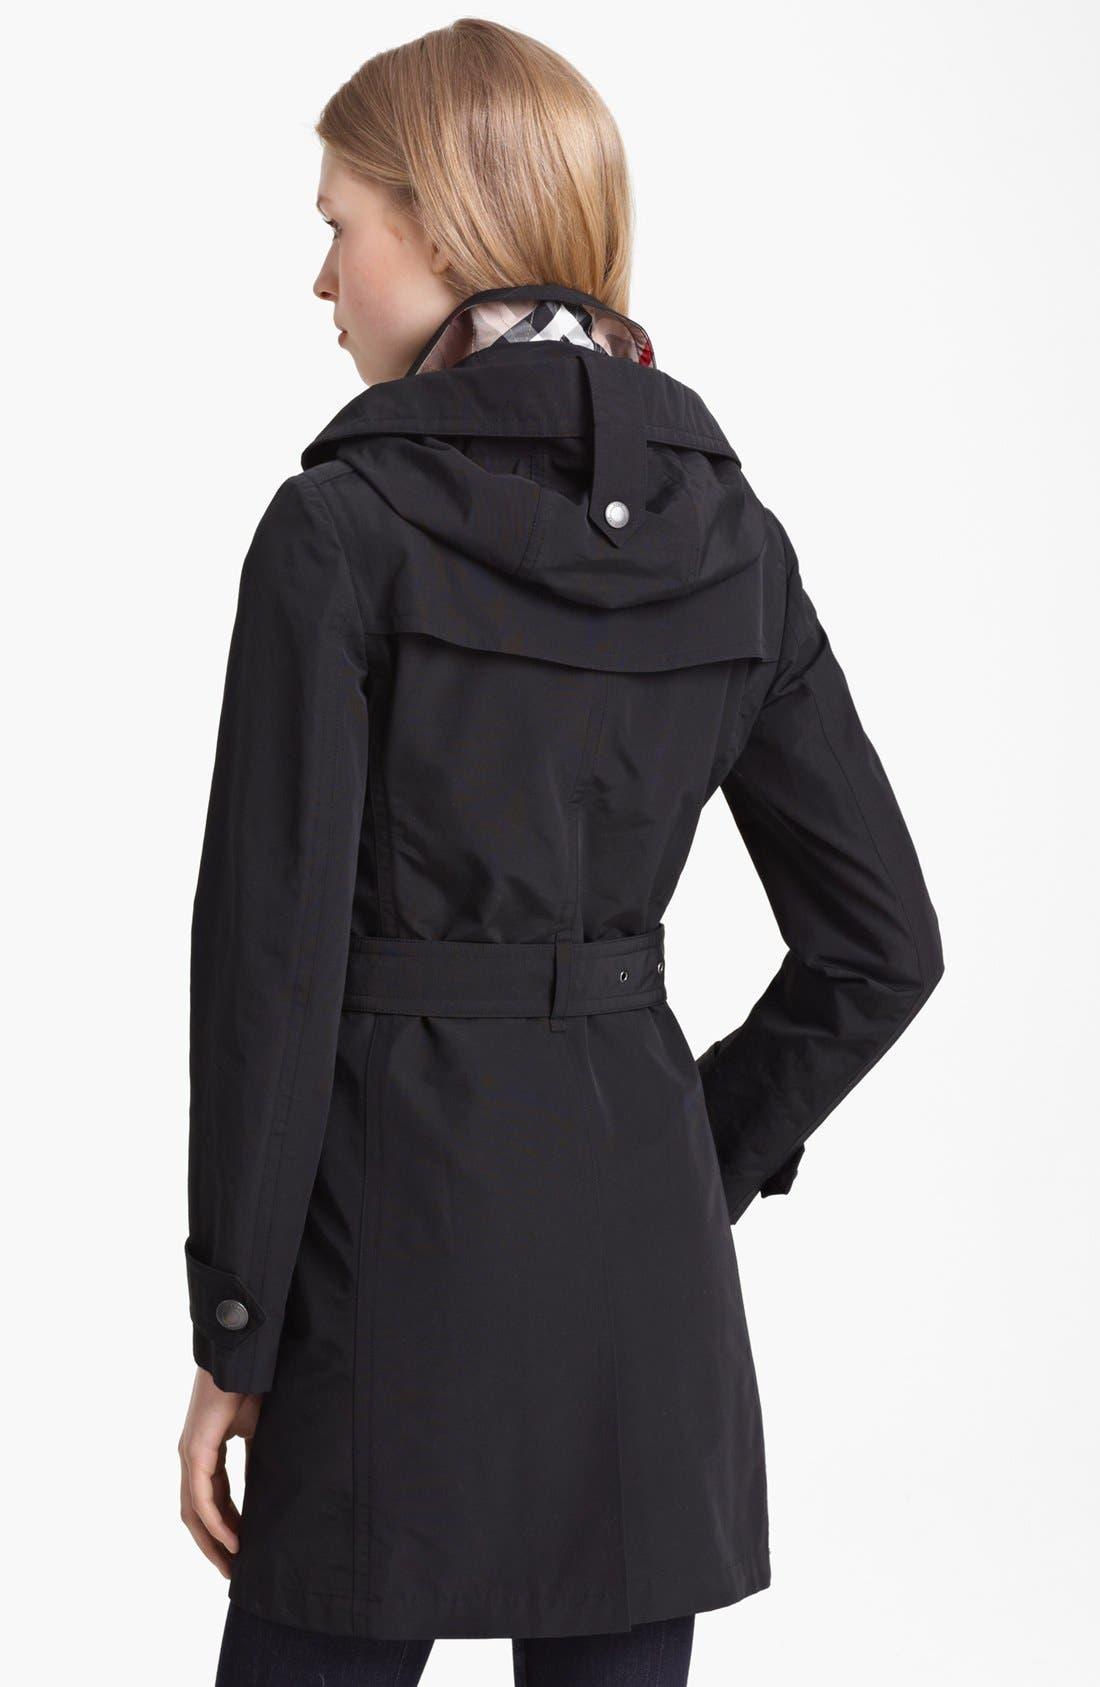 'Balmoral' Trench Coat,                             Alternate thumbnail 3, color,                             001